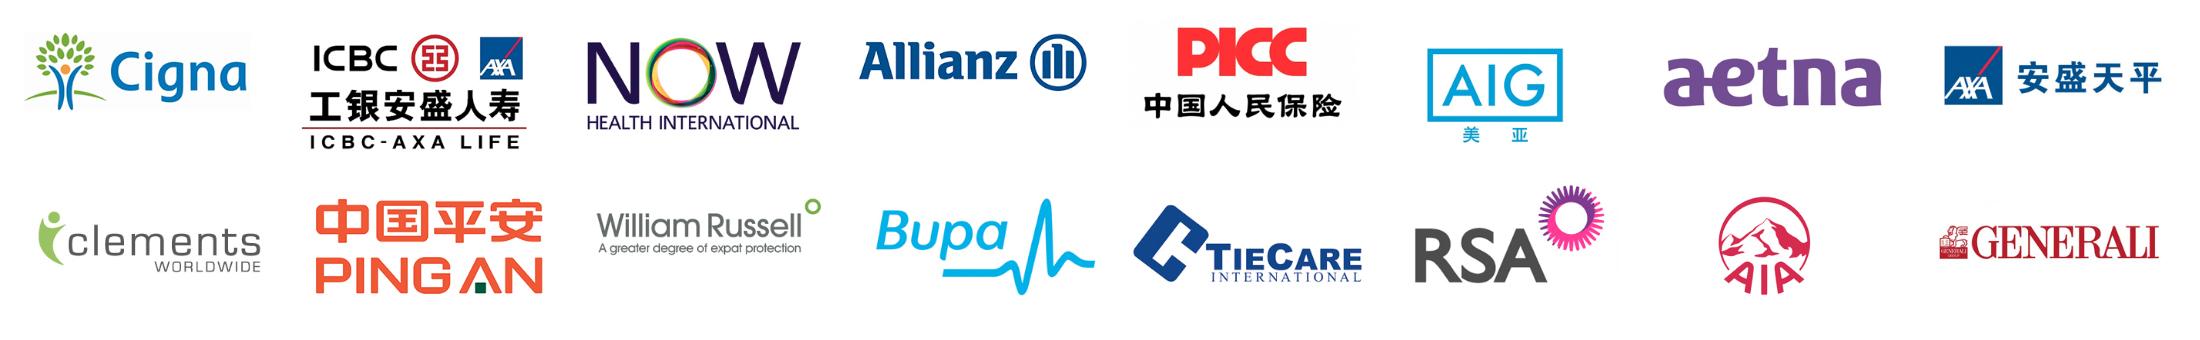 China Health Insurance Logos